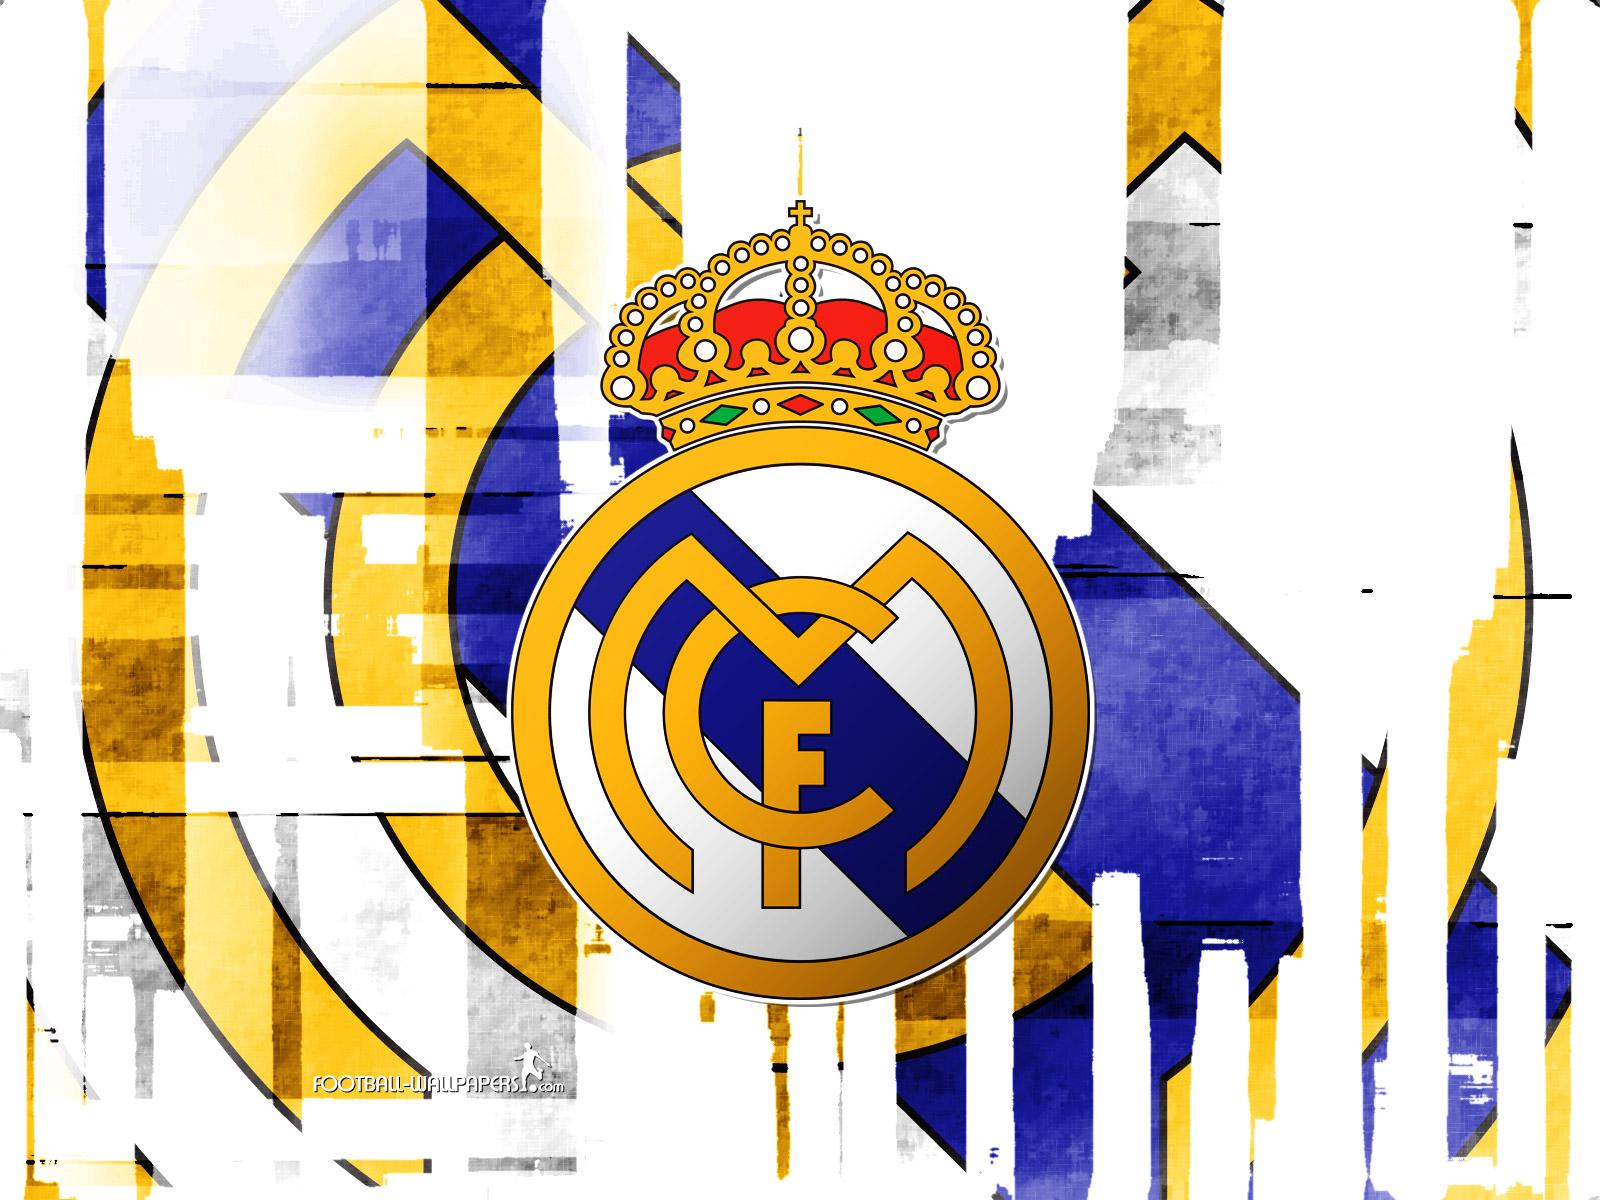 http://3.bp.blogspot.com/-OD7whN7C8Qs/Tlz9oKgVRxI/AAAAAAAAFmU/a0agWKrmM9k/s1600/logo_del_real_madrid_766.jpg